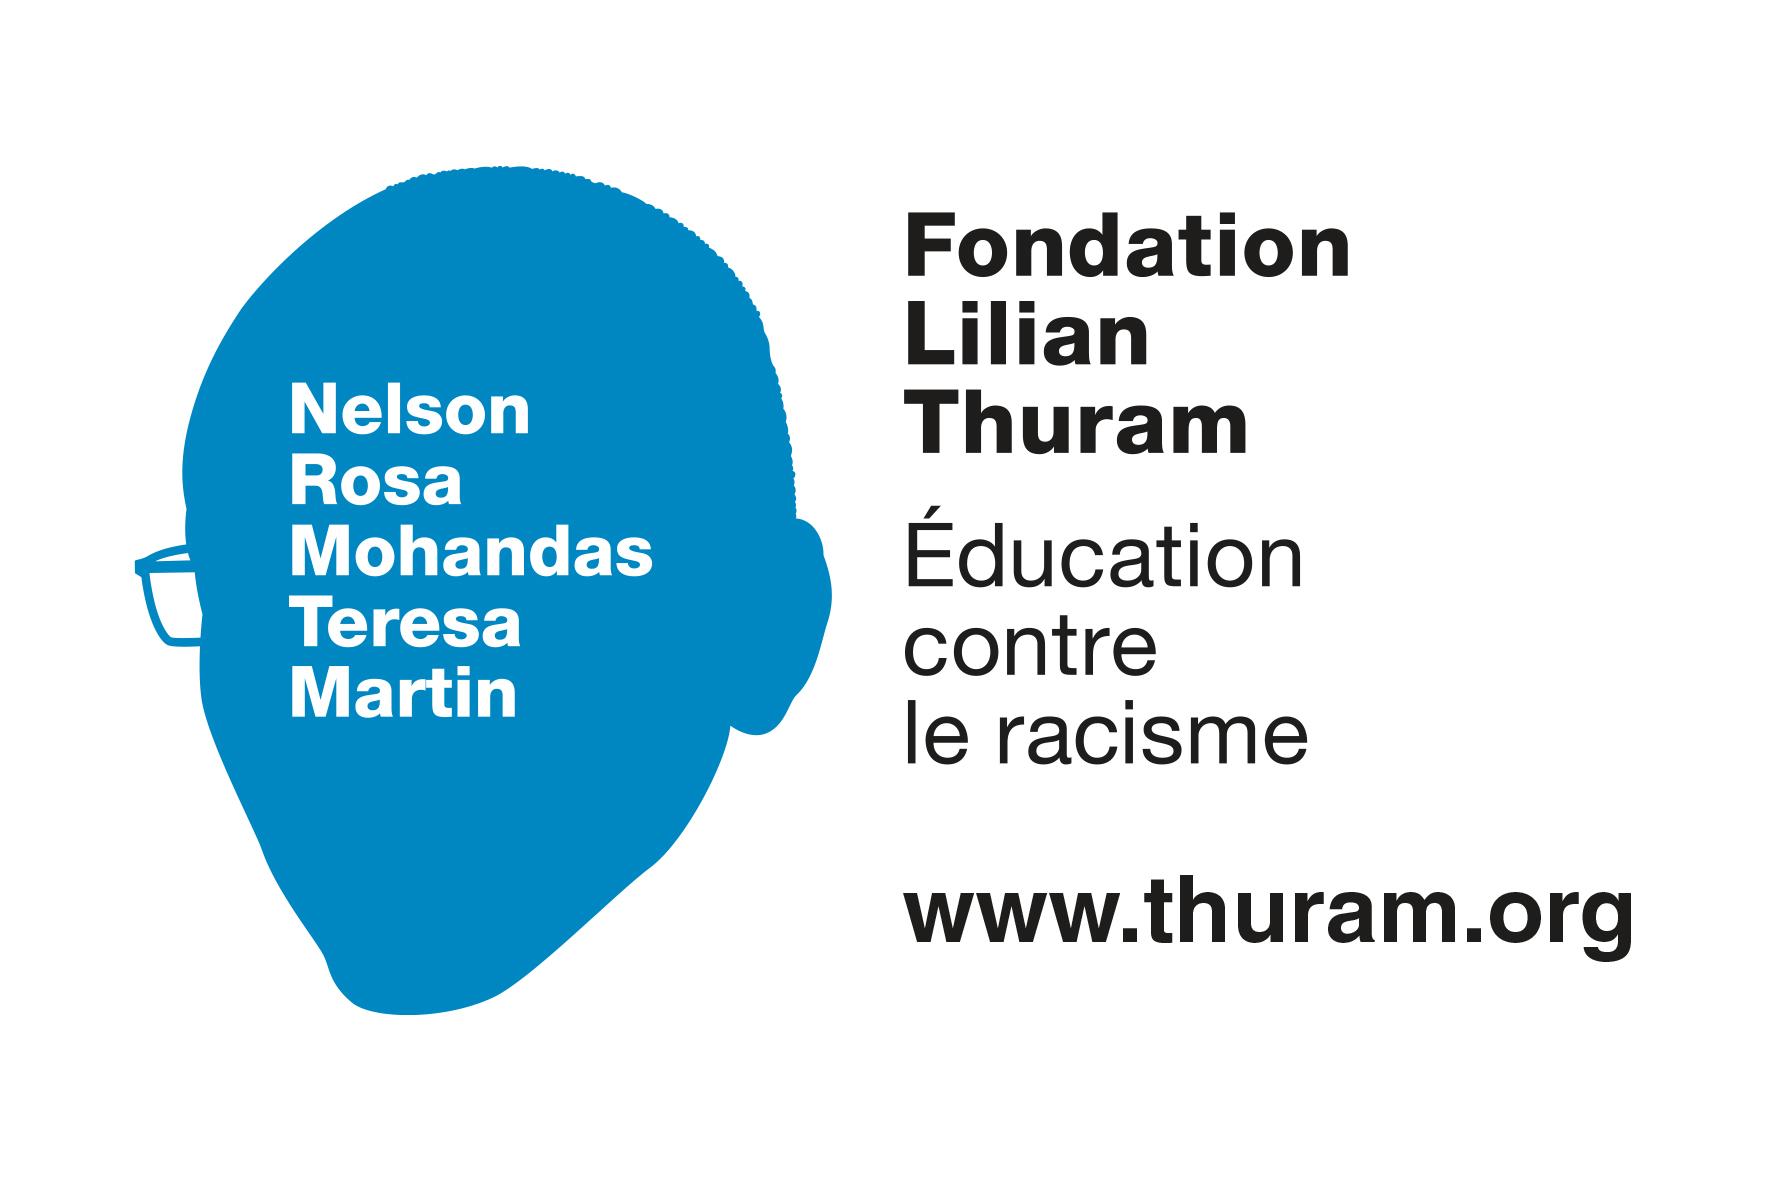 Fondation Lilian thuram logo